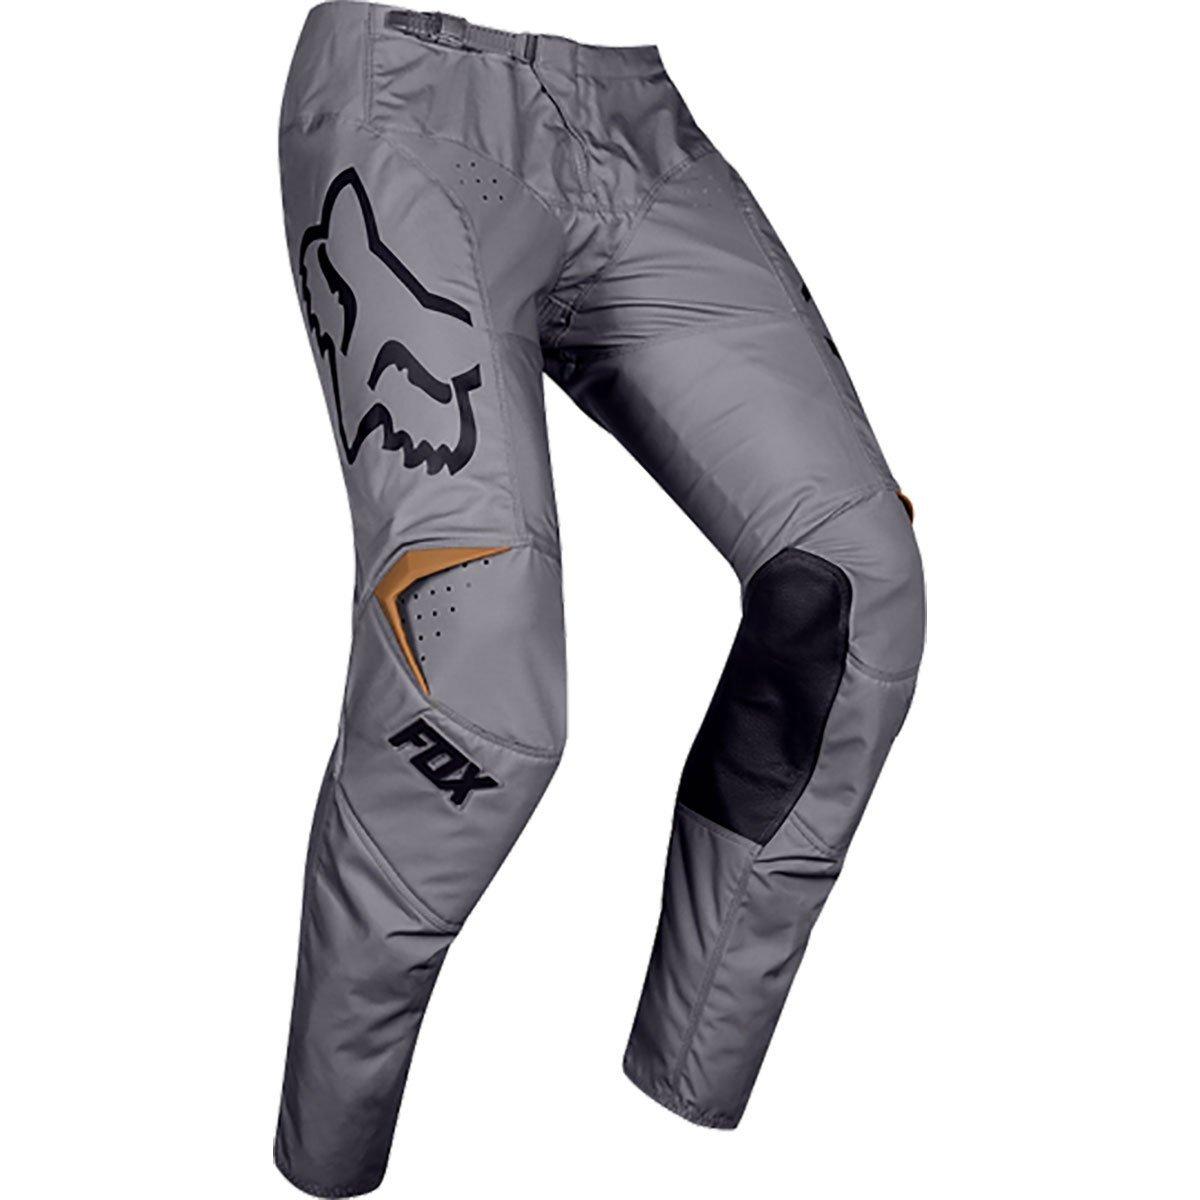 Fox Racing 180 Przm Men's Off-Road Motorcycle Pants - Stone / 30 by Fox Racing (Image #2)